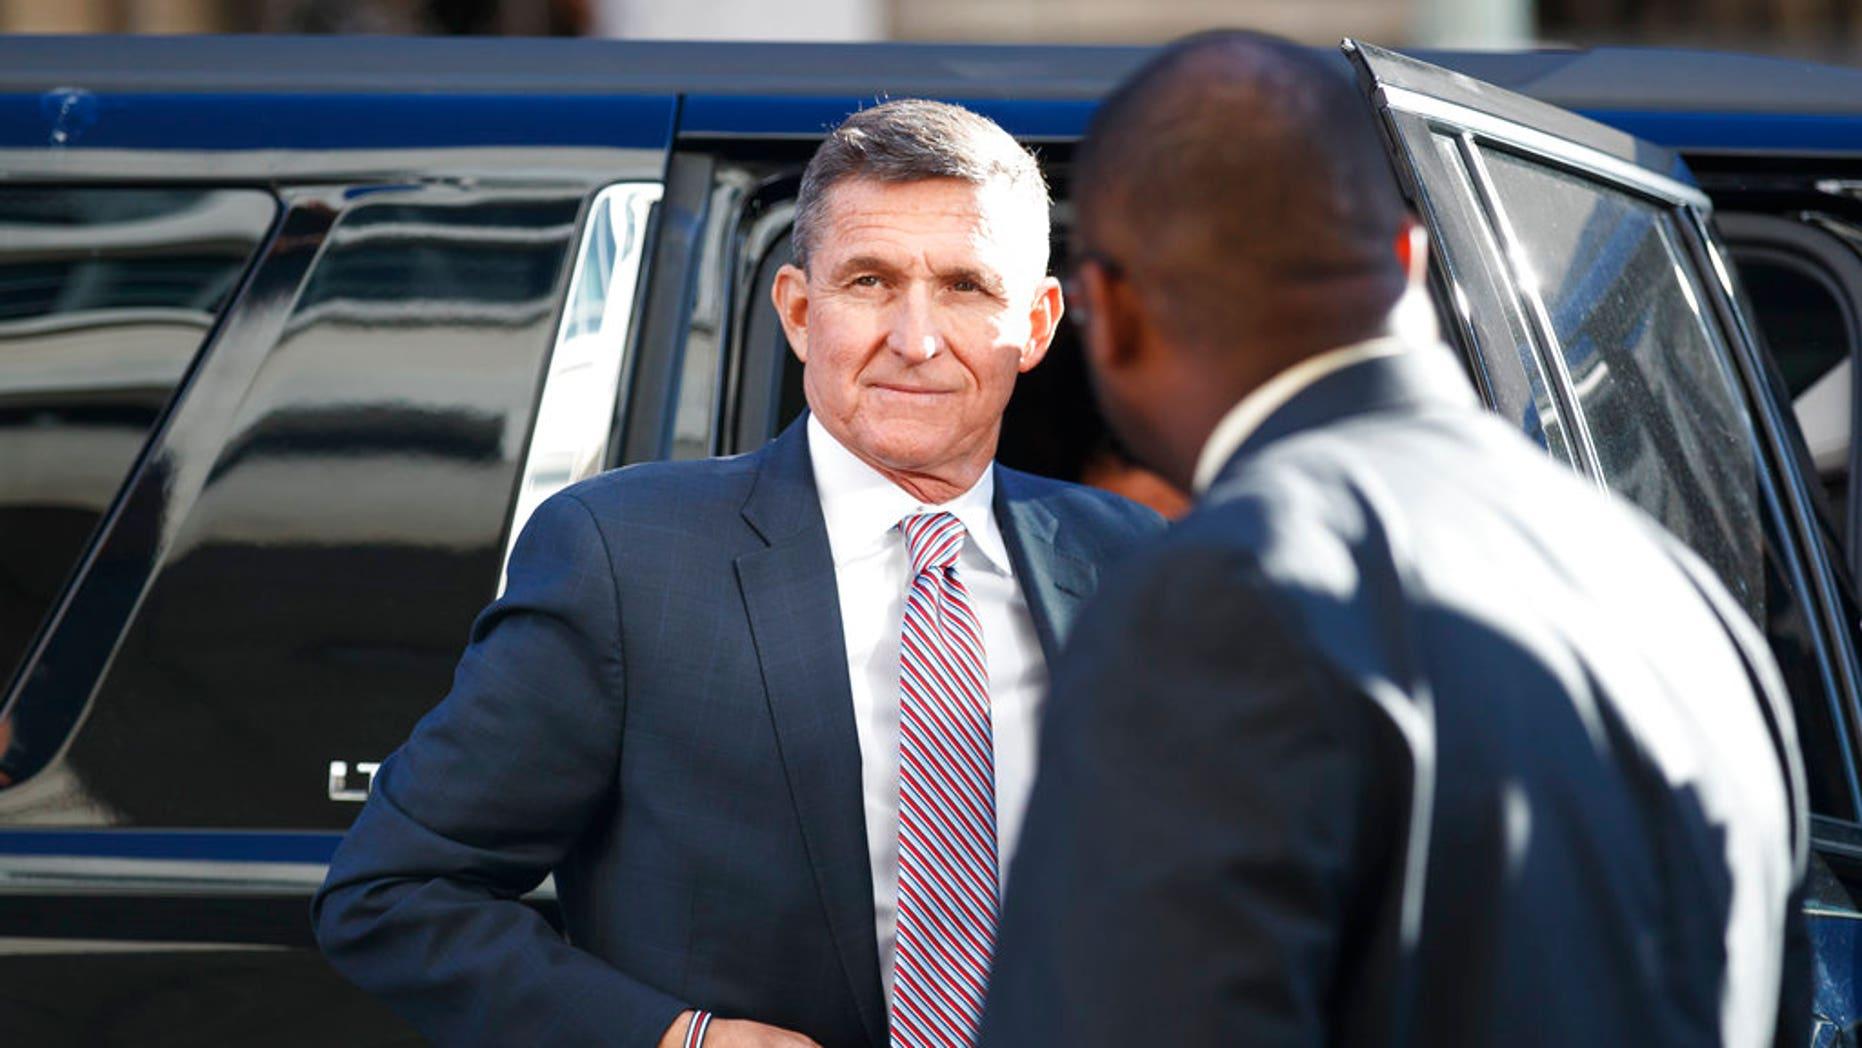 President Donald Trump's former National Security Advisor Michael Flynn arrives at federal court in Washington, Tuesday, Dec. 18, 2018. (AP Photo/Carolyn Kaster)